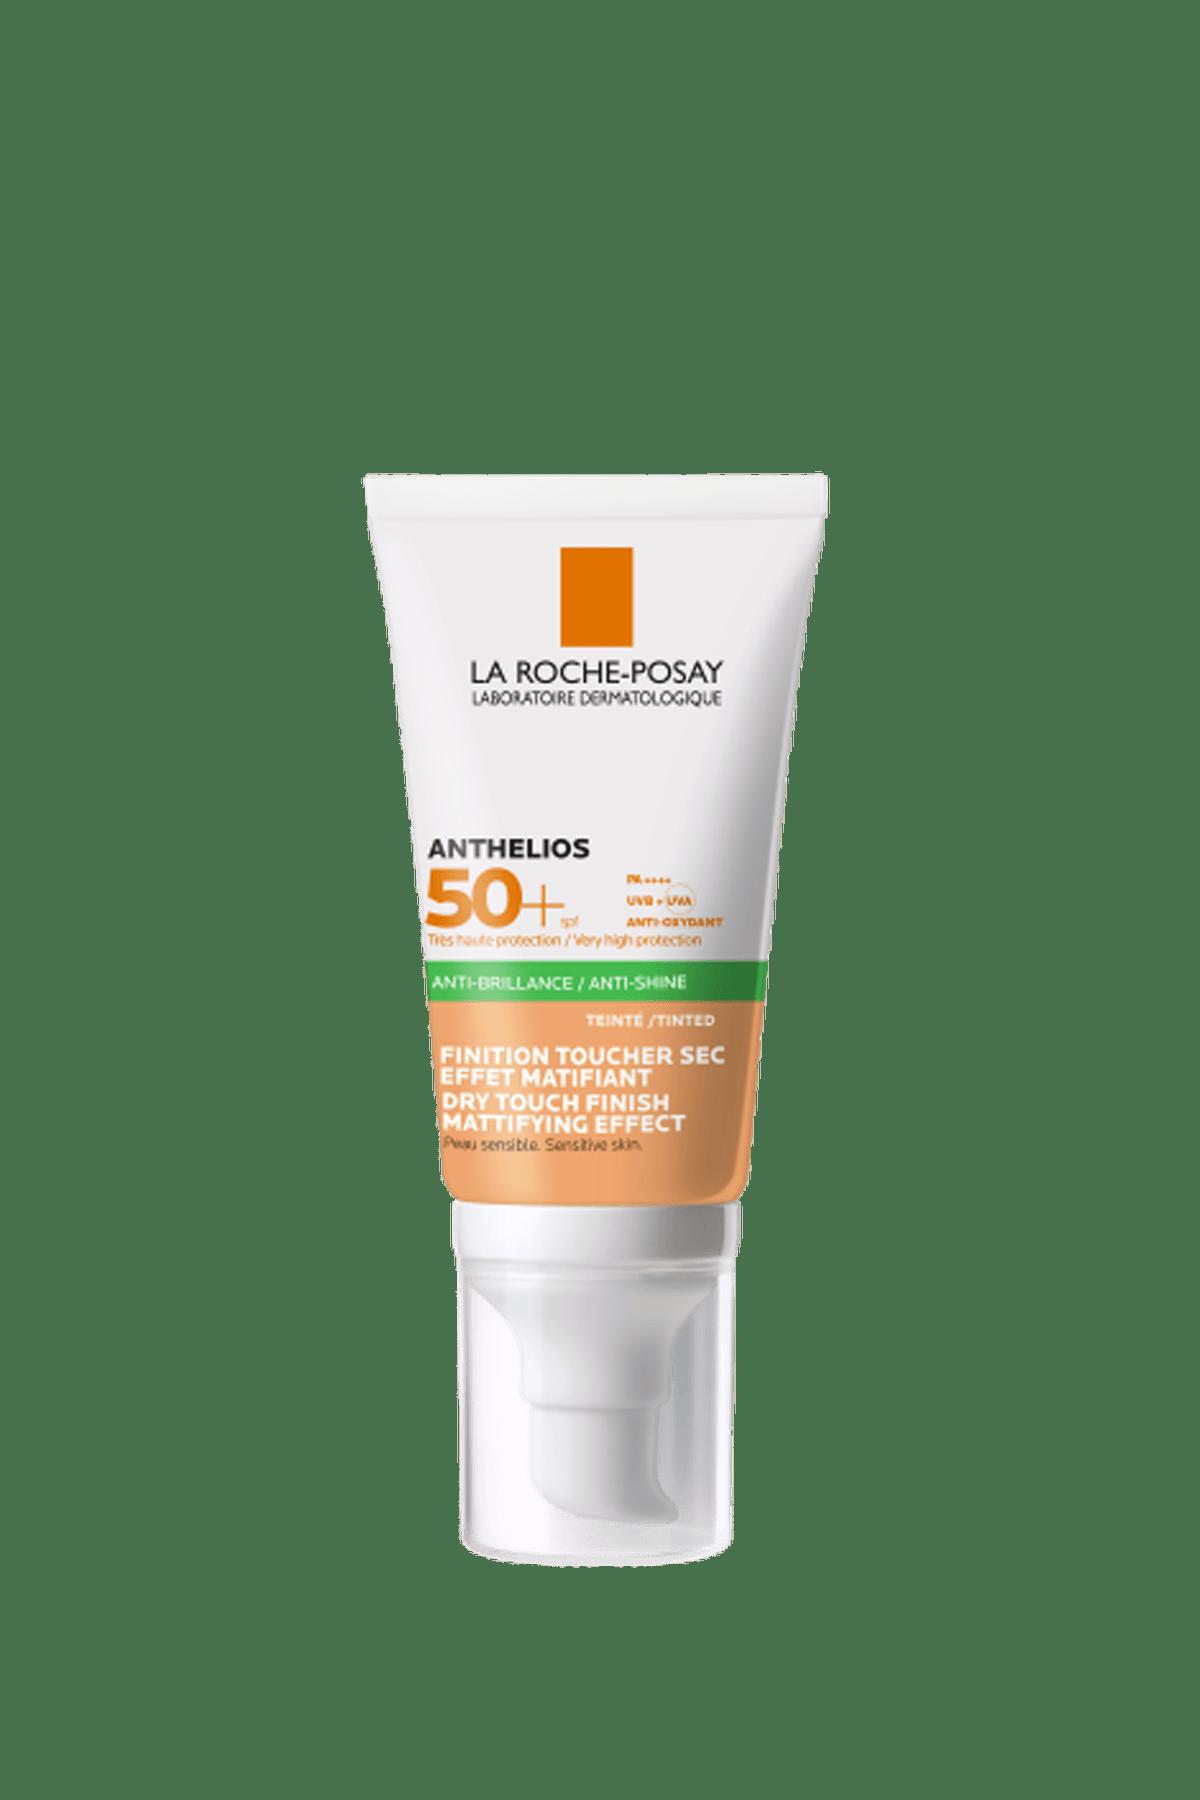 La Roche Posay Anthelios Xl Spf 50+ Tinted Dry Touch Gel-Cream Yüksek Güneş Koruması 50 ml 0